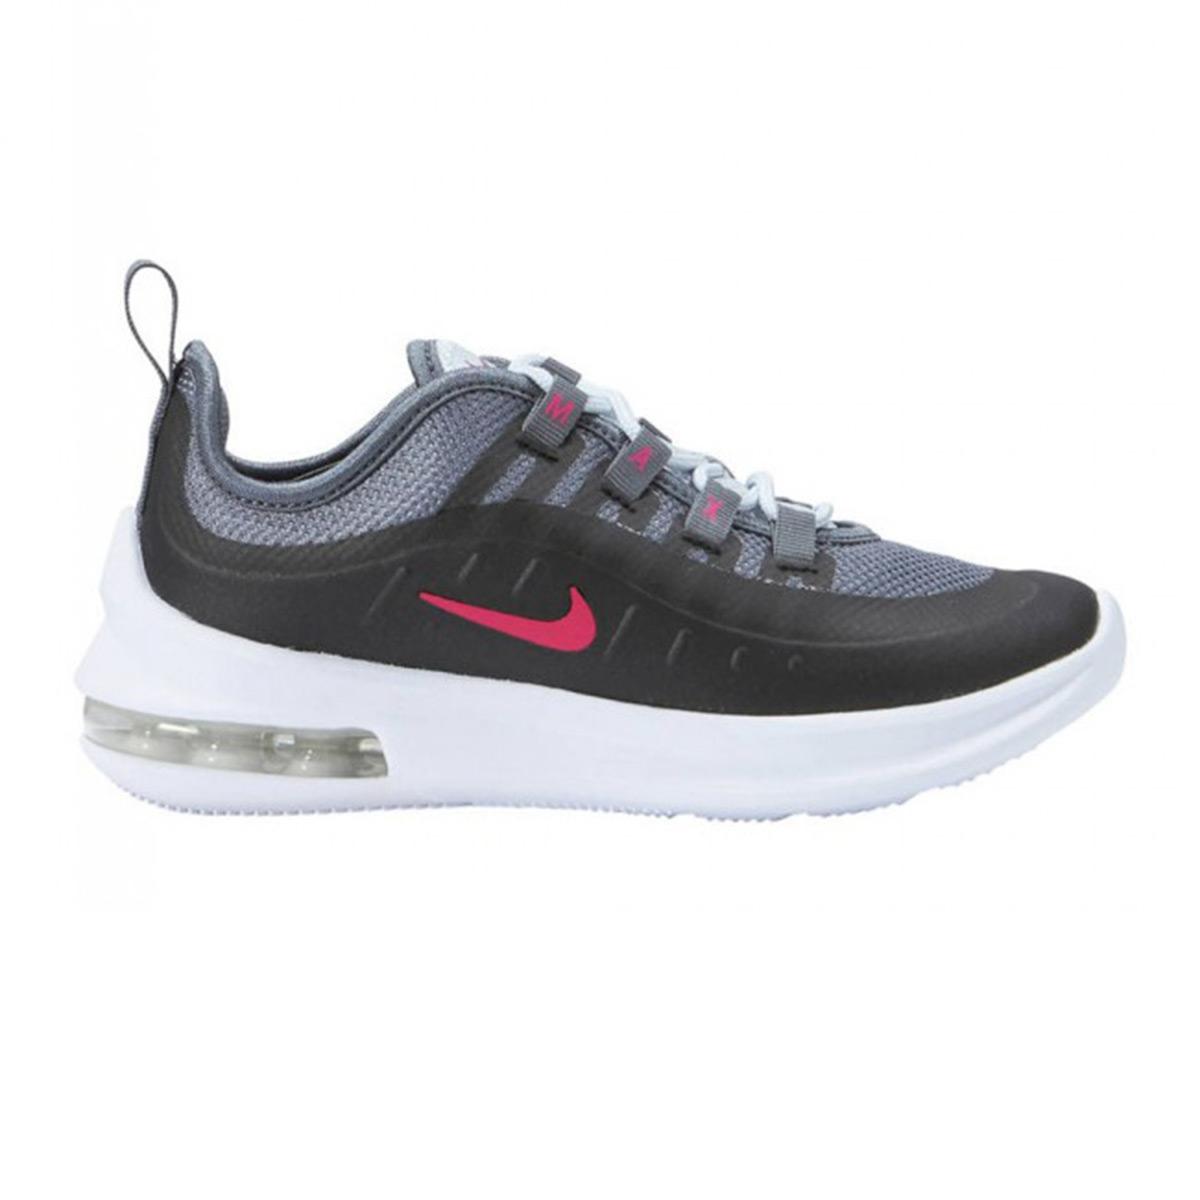 01a880c70e0 Nike Air Max Axis (ps) Junior - Schoenen - Casual - Intersport van ...